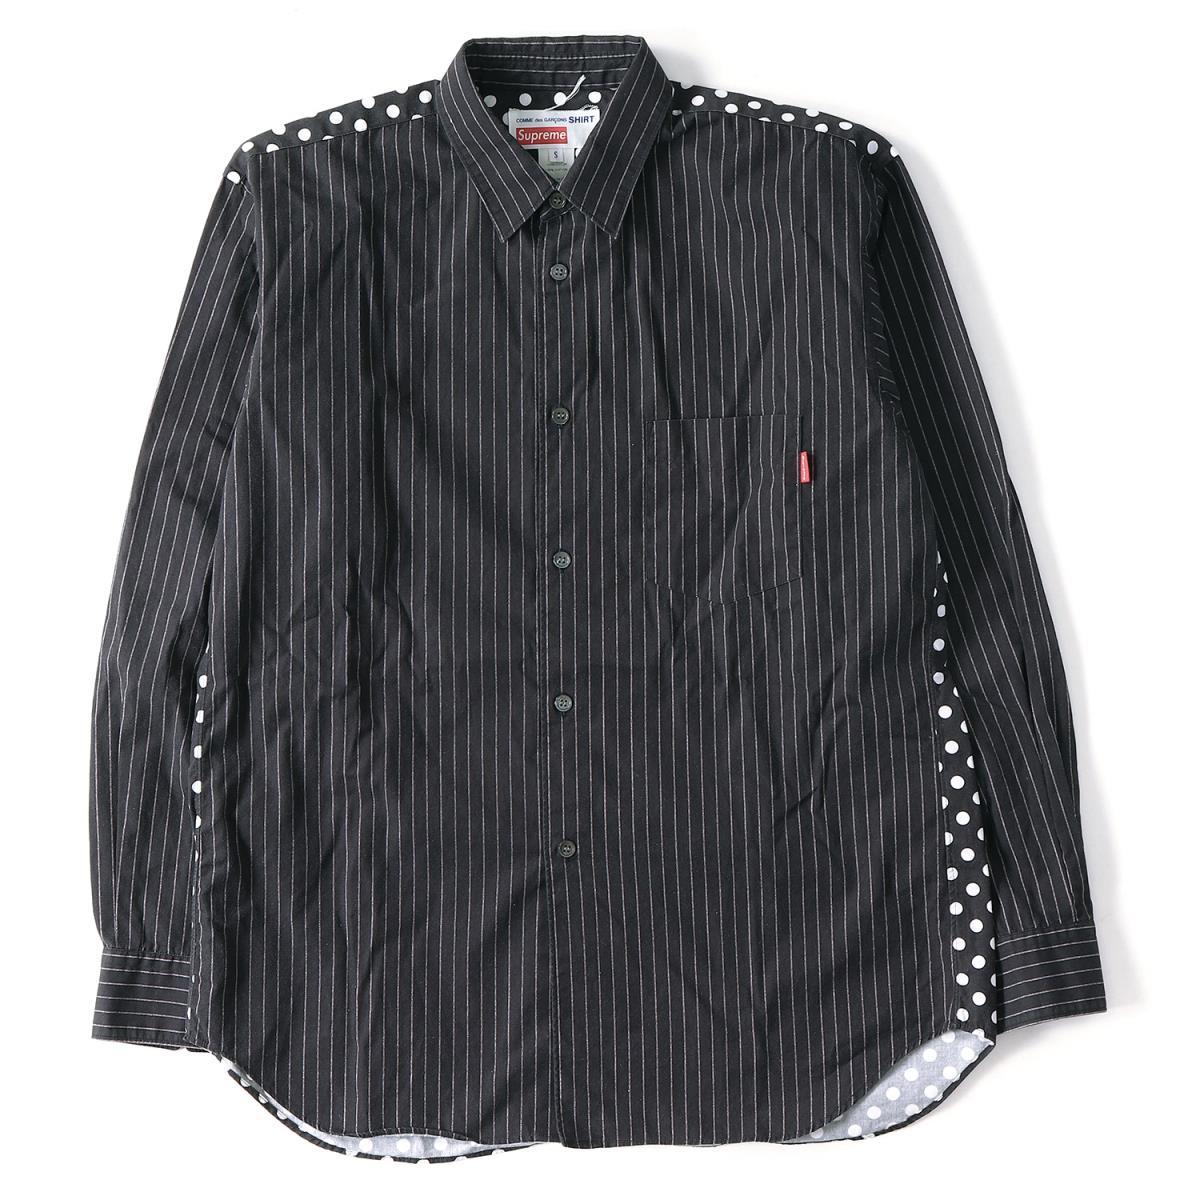 Supreme (シュプリーム) 14S/S ×COMME des GARCONS SHIRTS ストライプシャツ(Button-DownShirt) ブラック×ホワイト S 【メンズ】【K2090】【中古】【あす楽☆対応可】